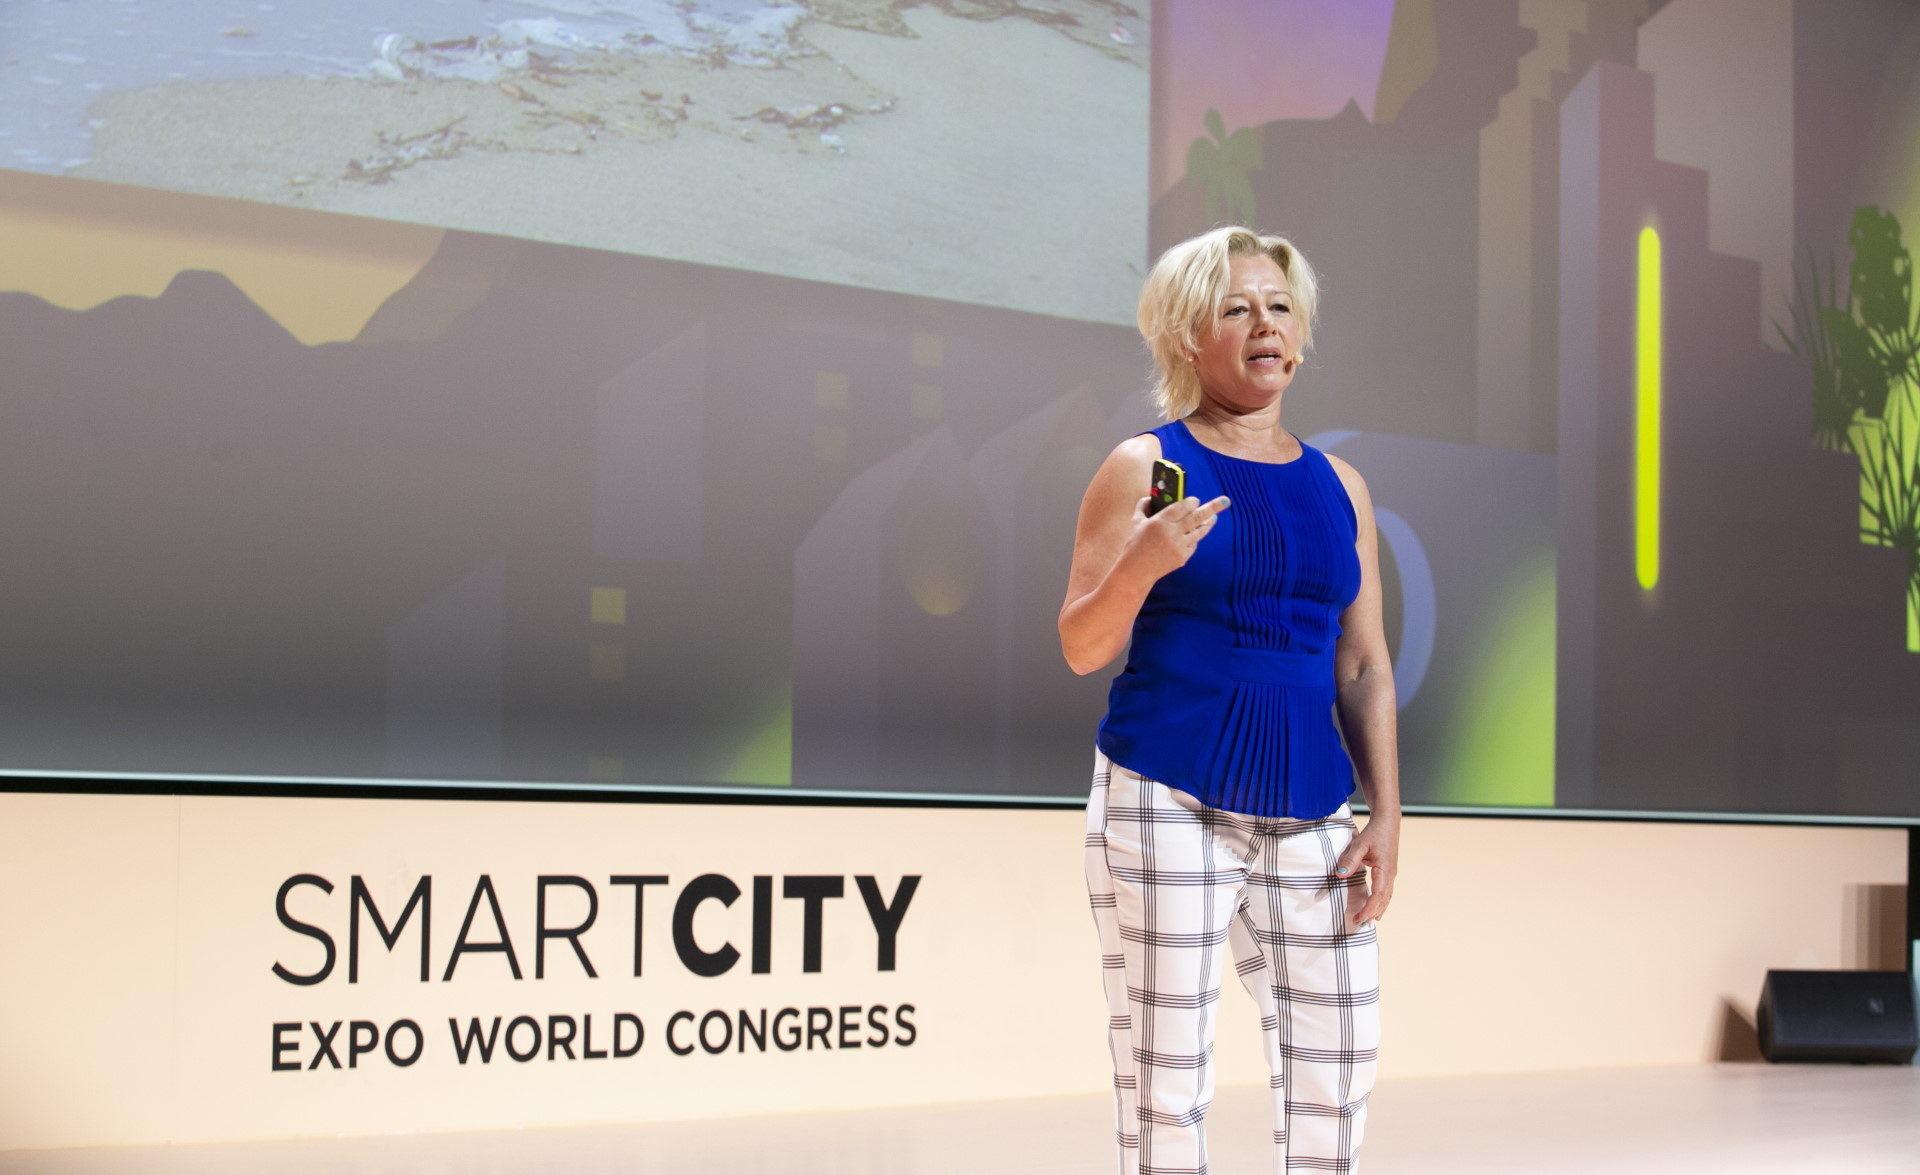 Laura Tenenbaum climate change